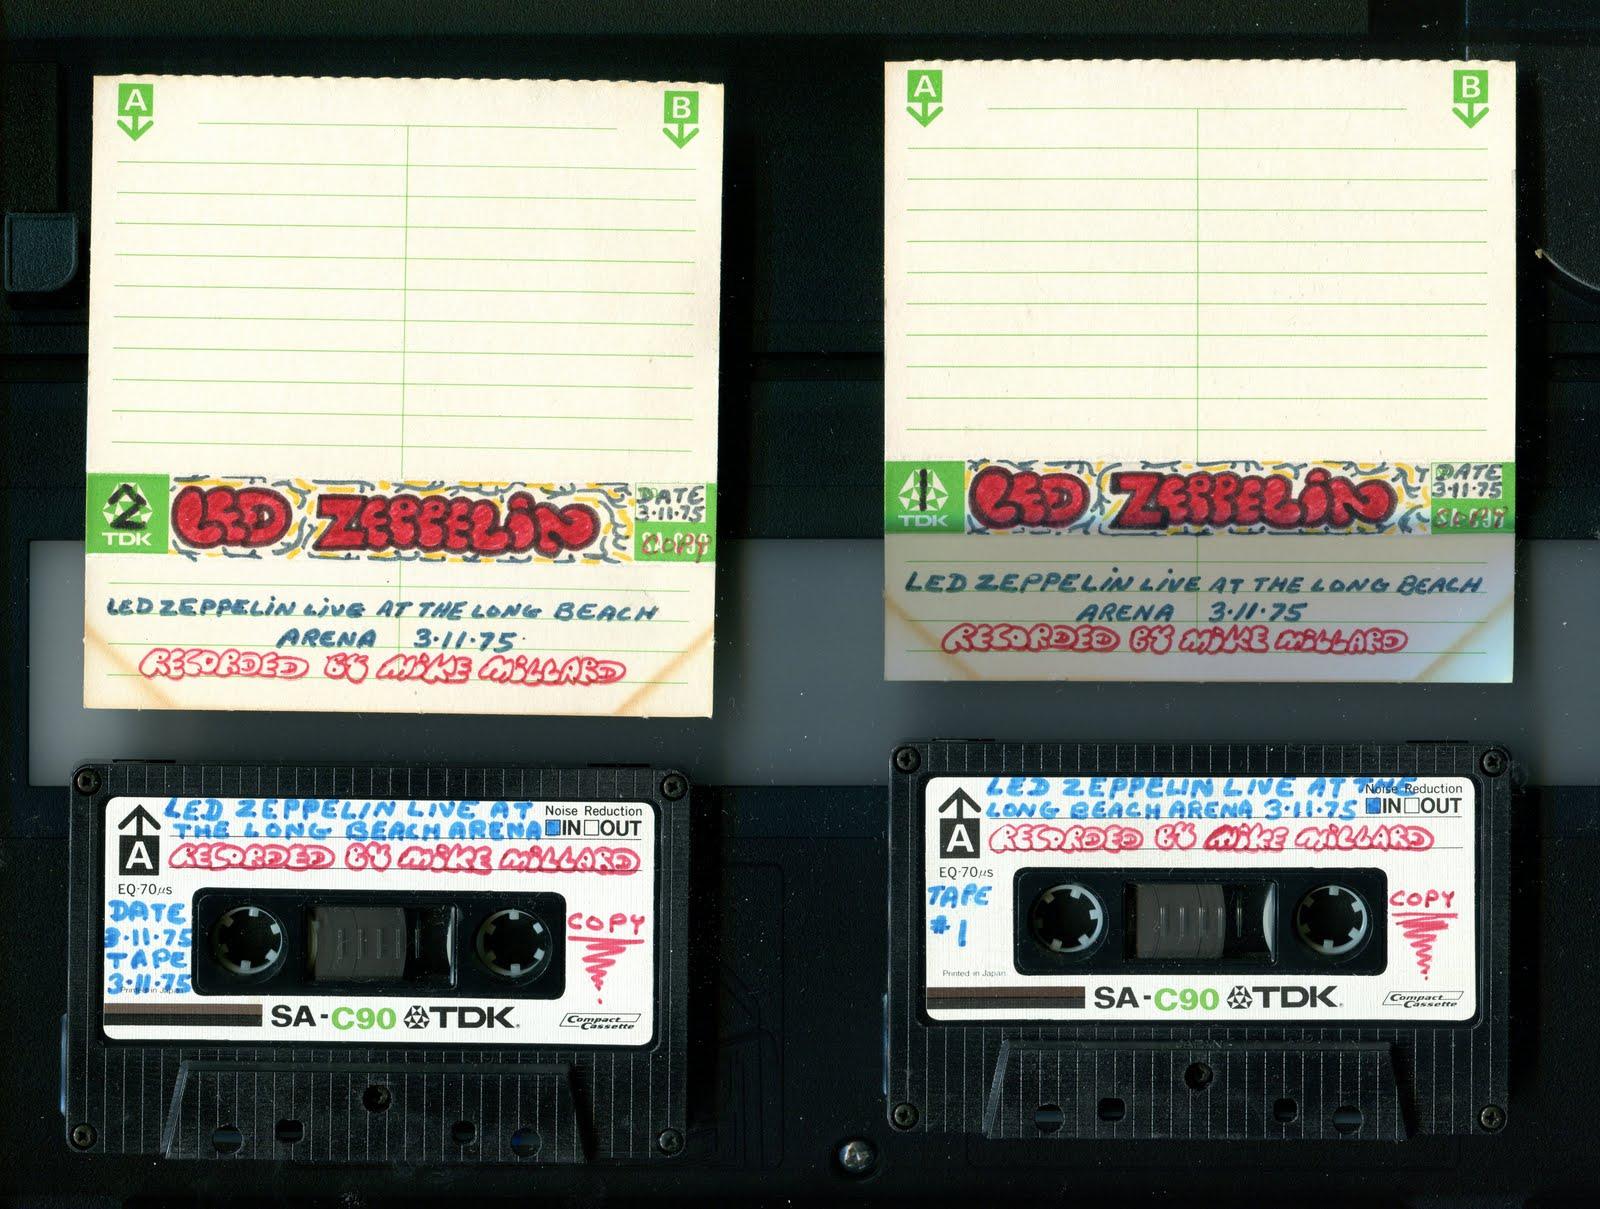 Bootleg Boys - Casa George ('97 Remixes)